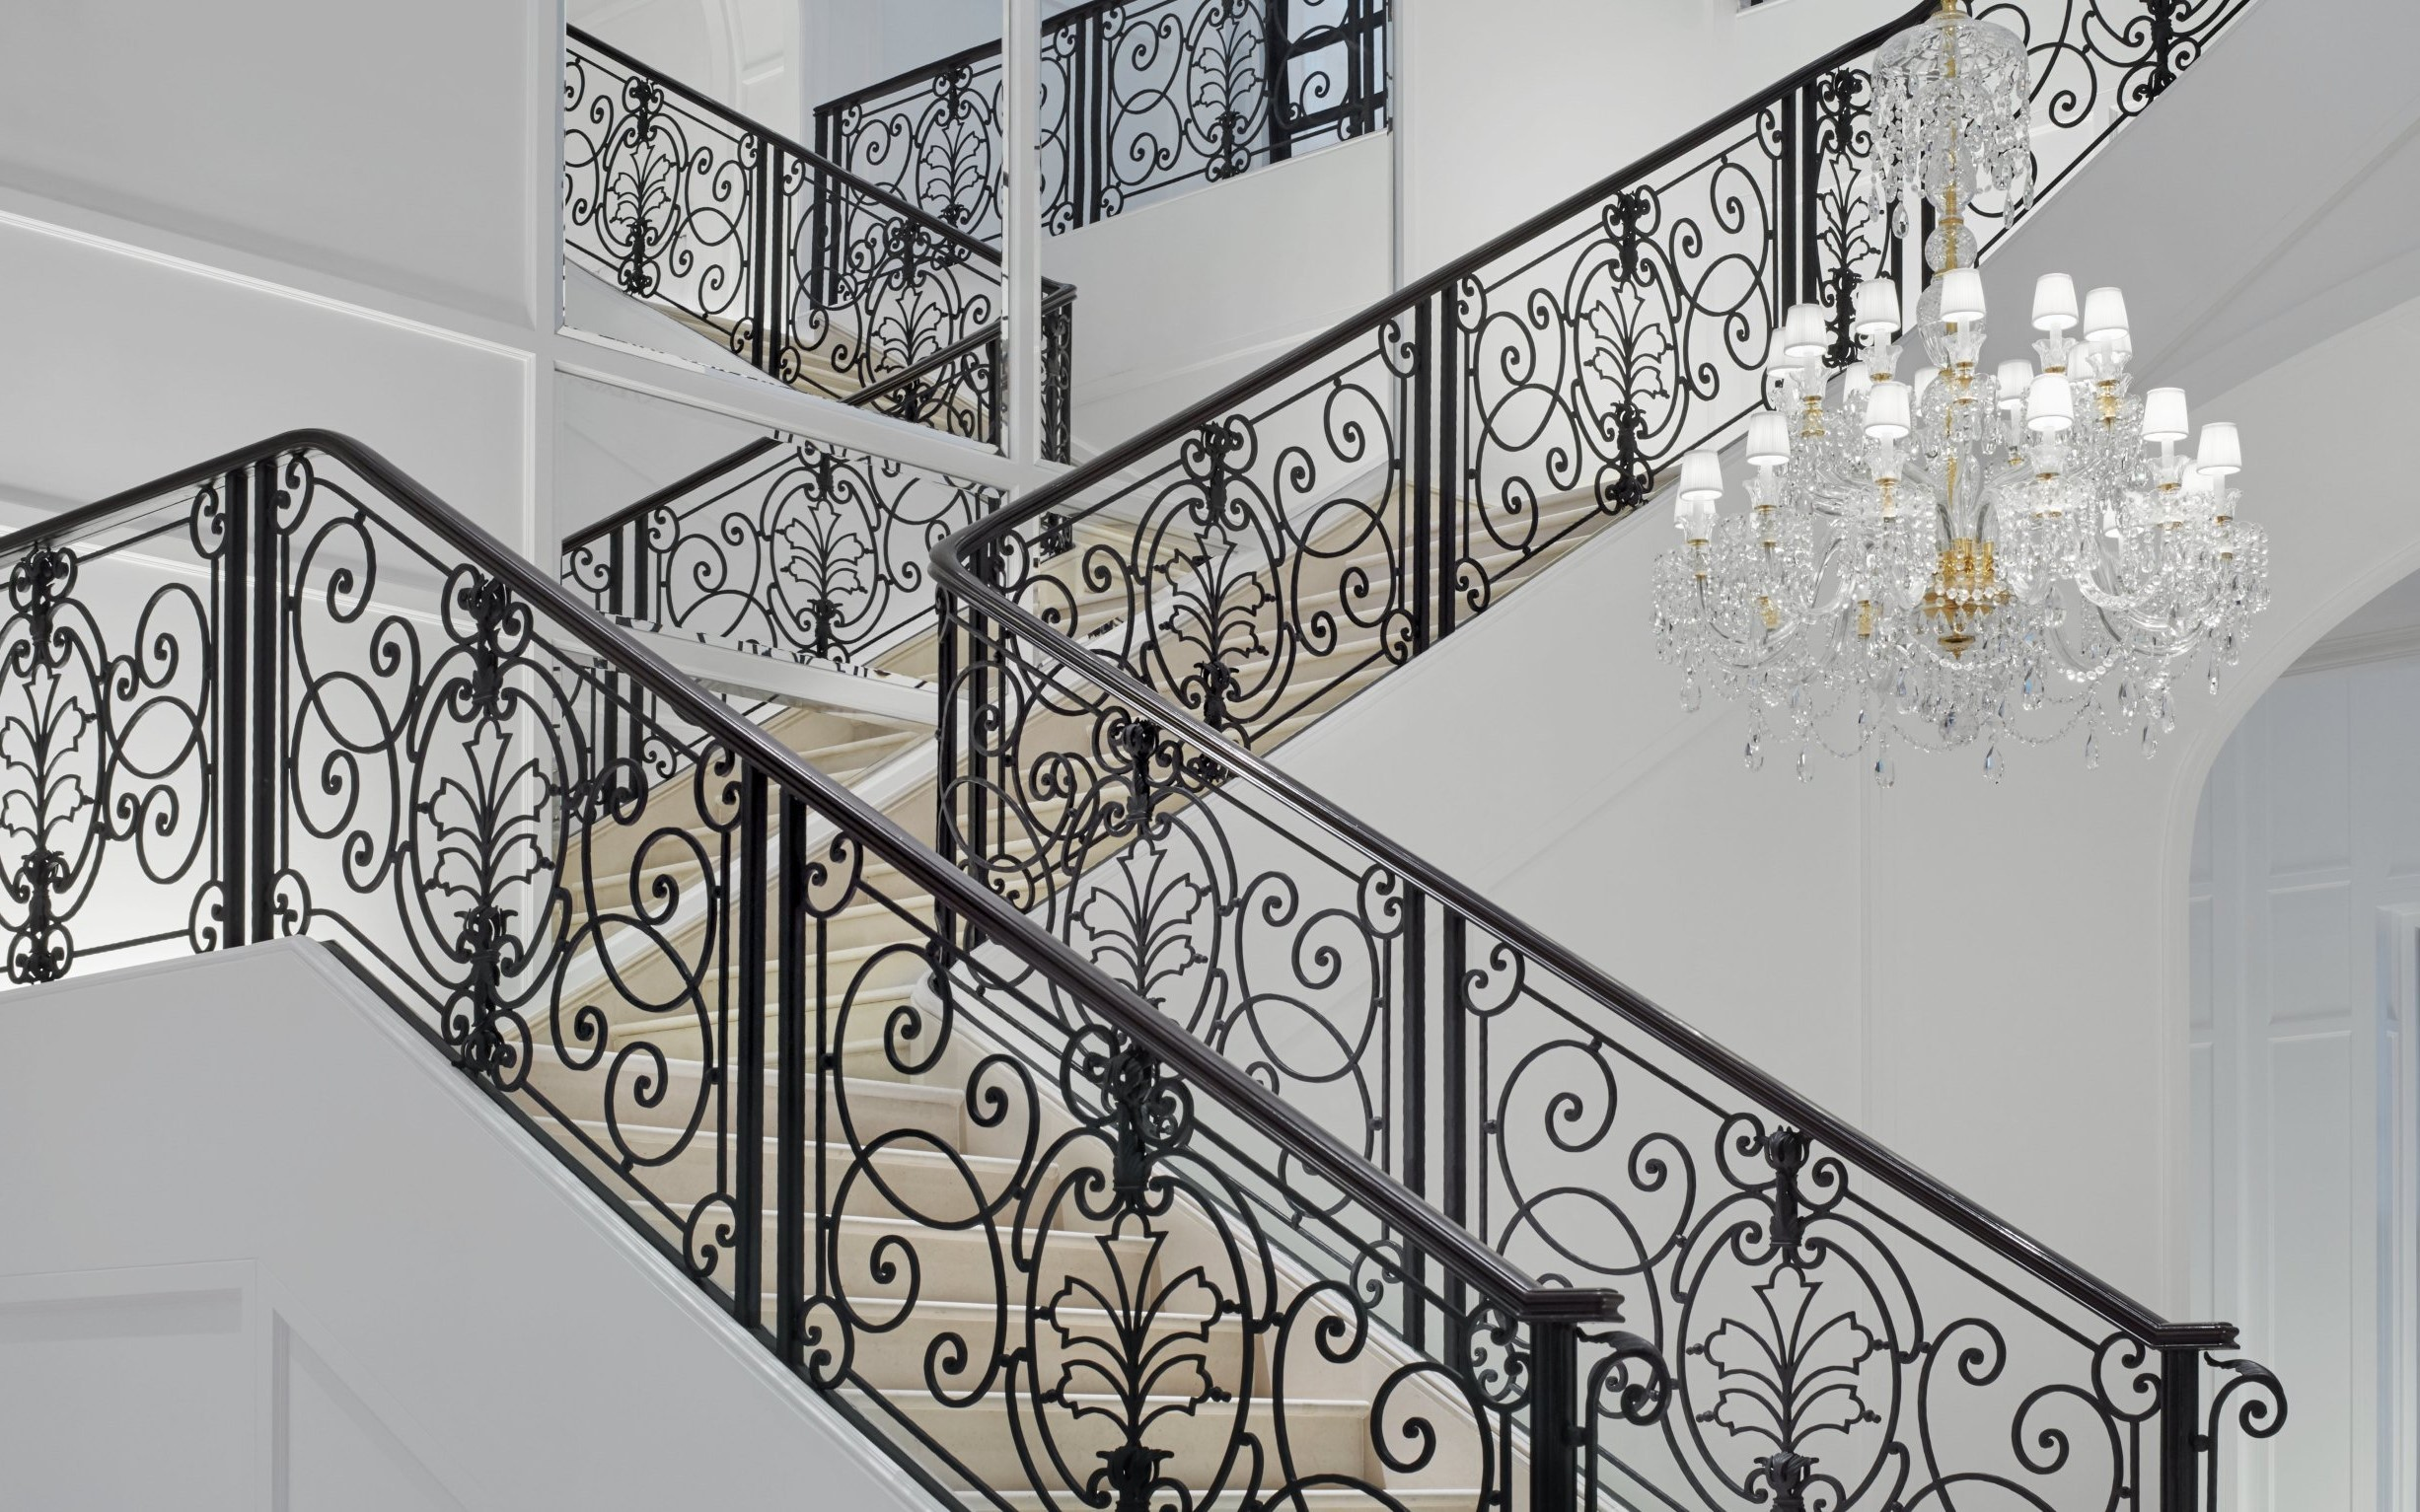 Escalier avec des balustrades élégantes.